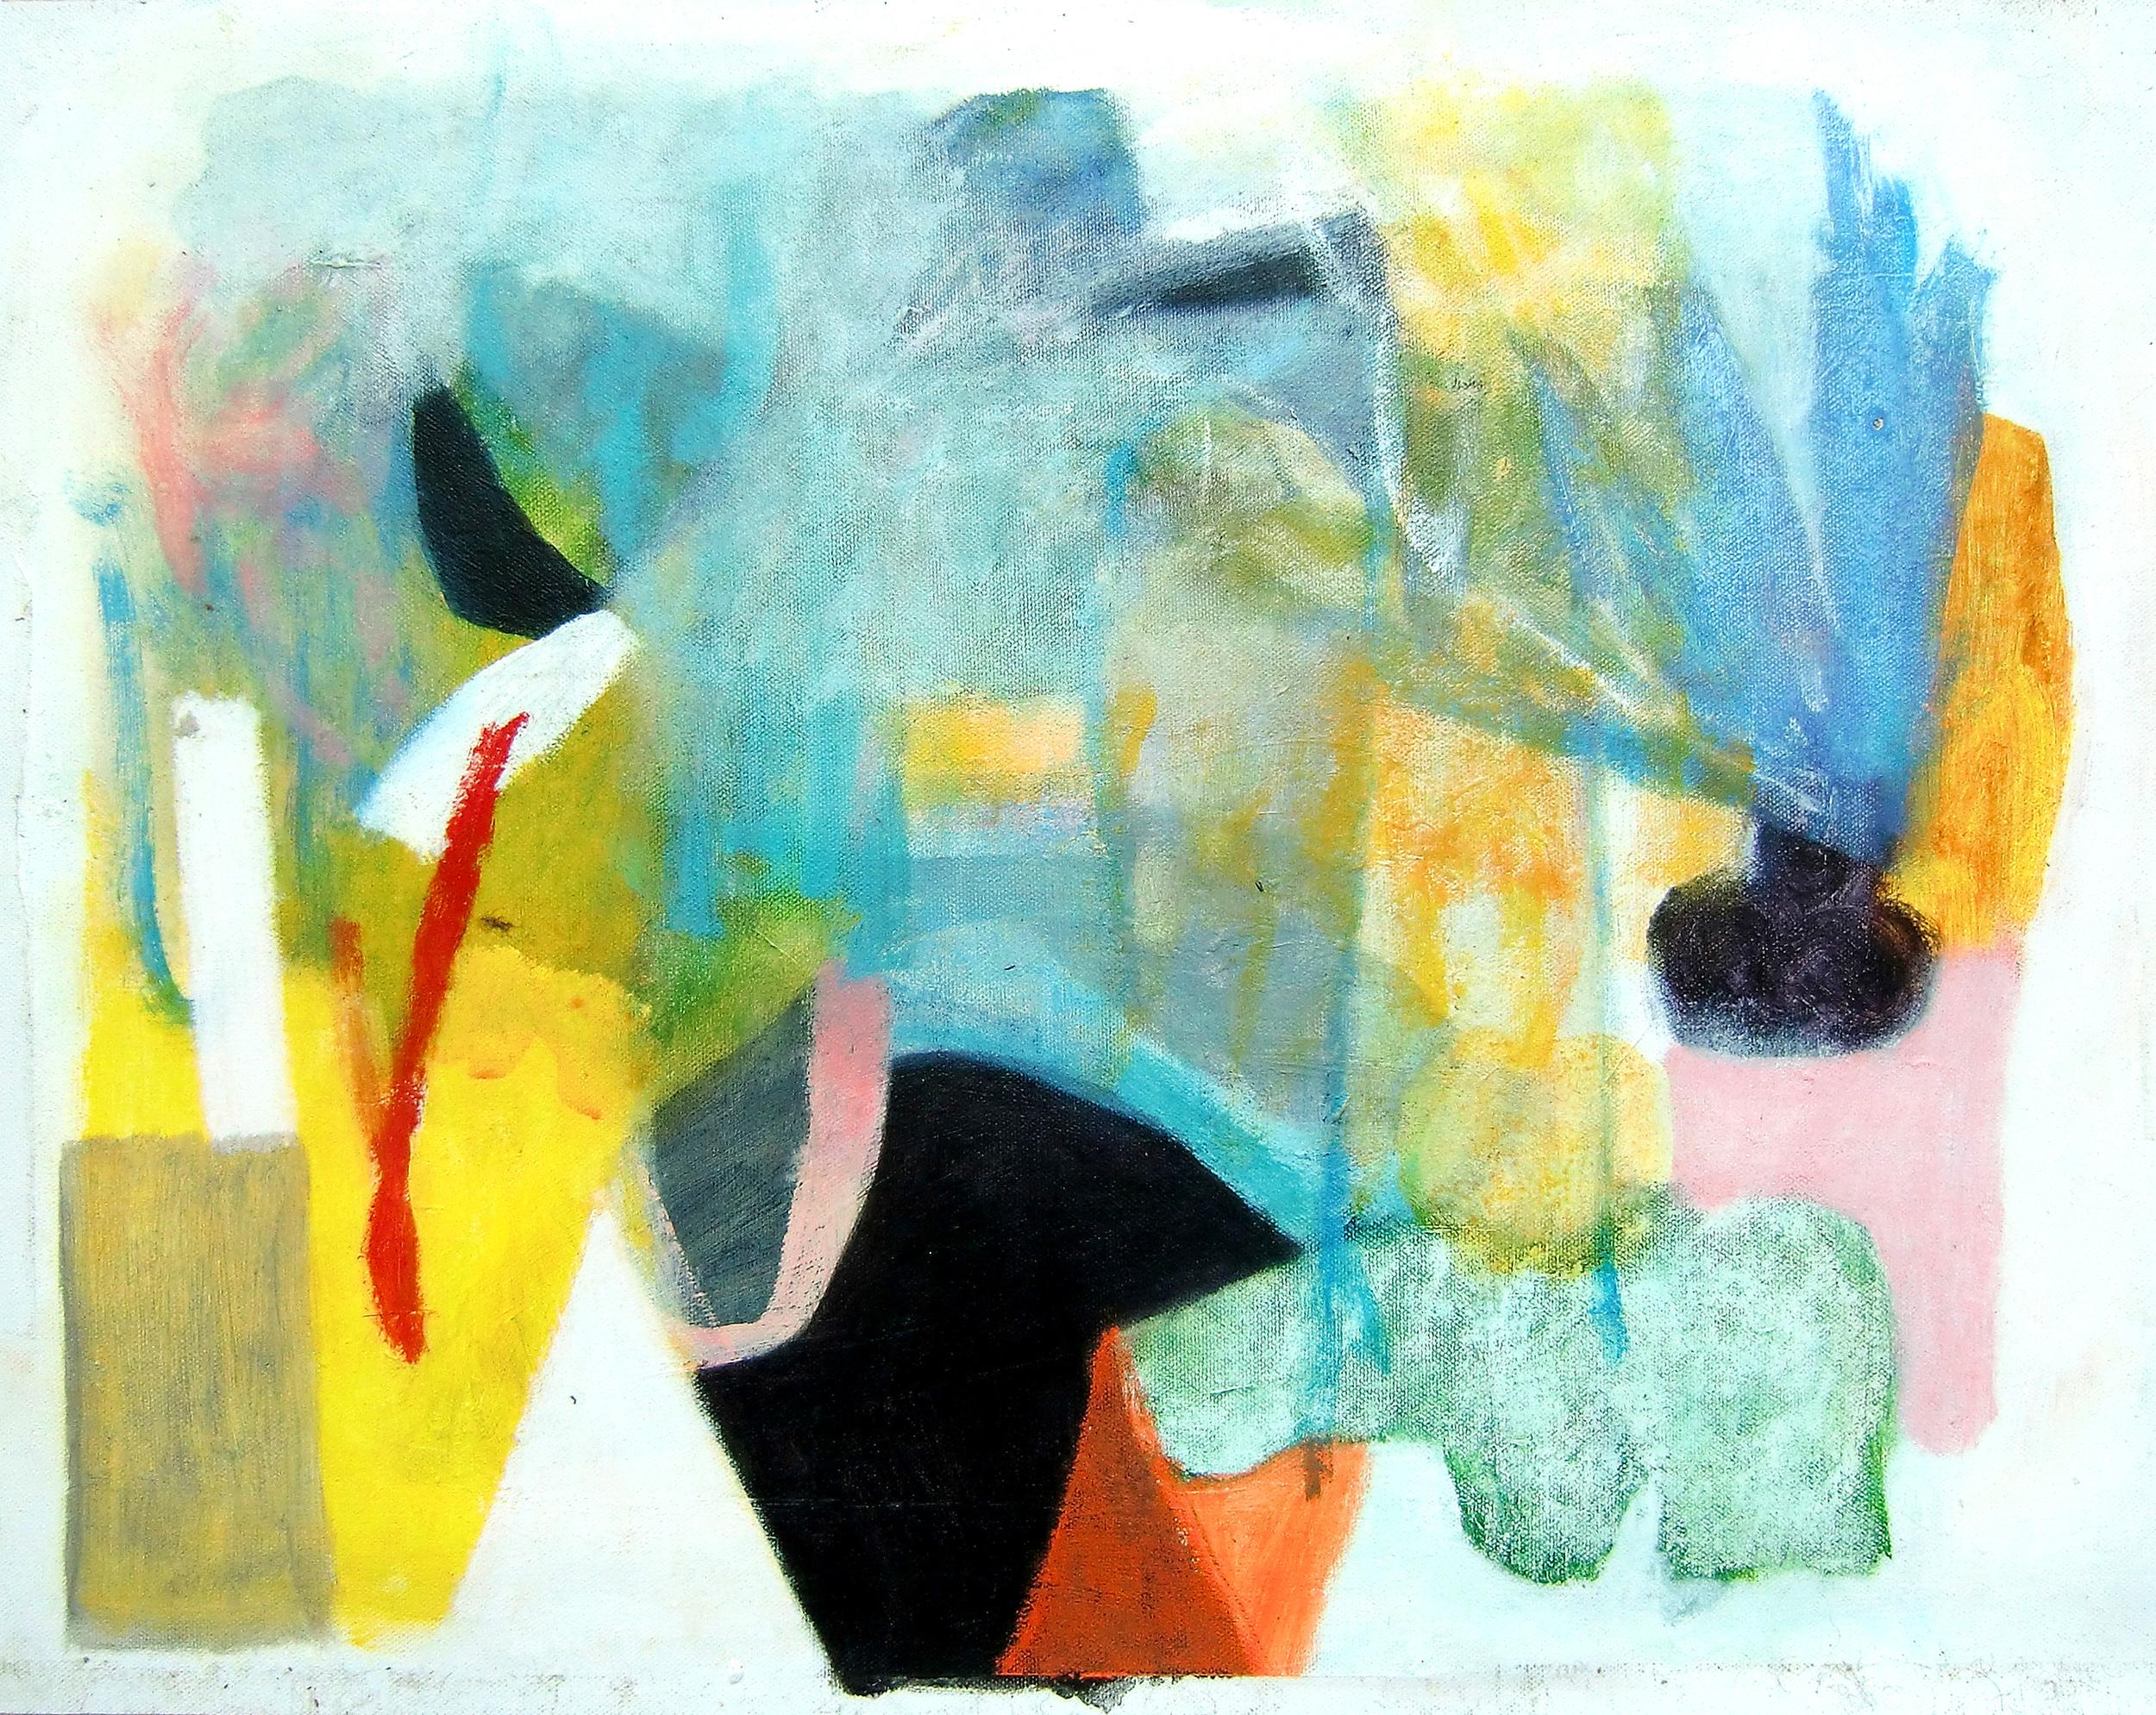 Untitled III 2012